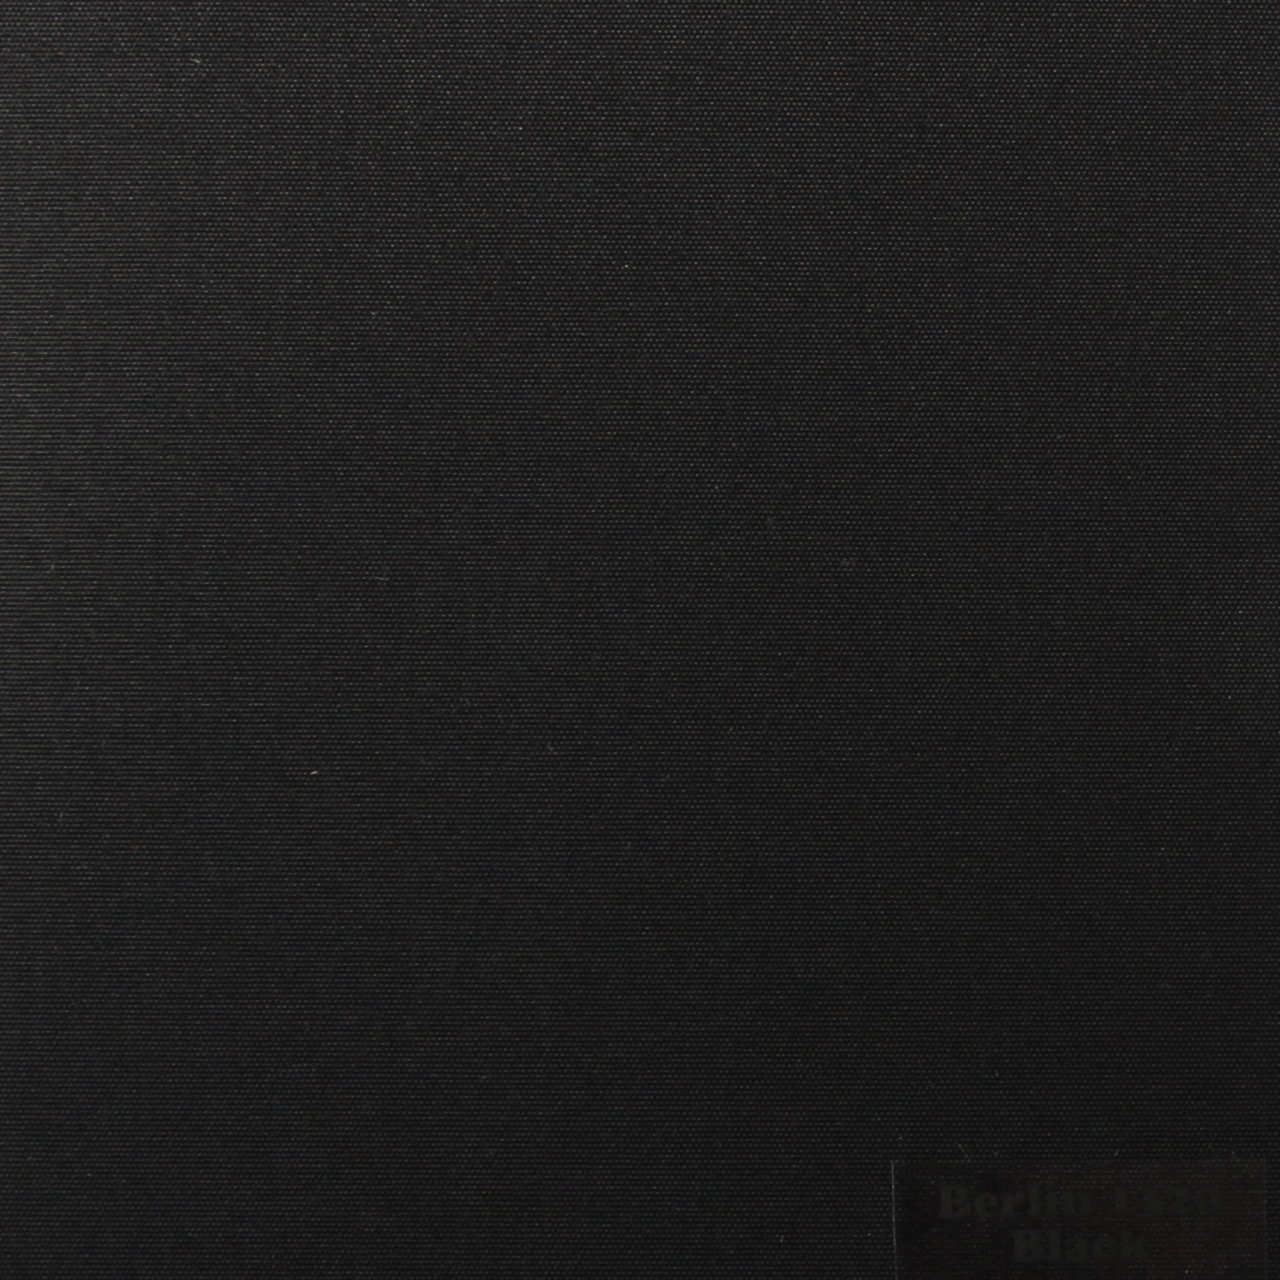 Рулонные шторы Ткань Берлин Чёрный 1320